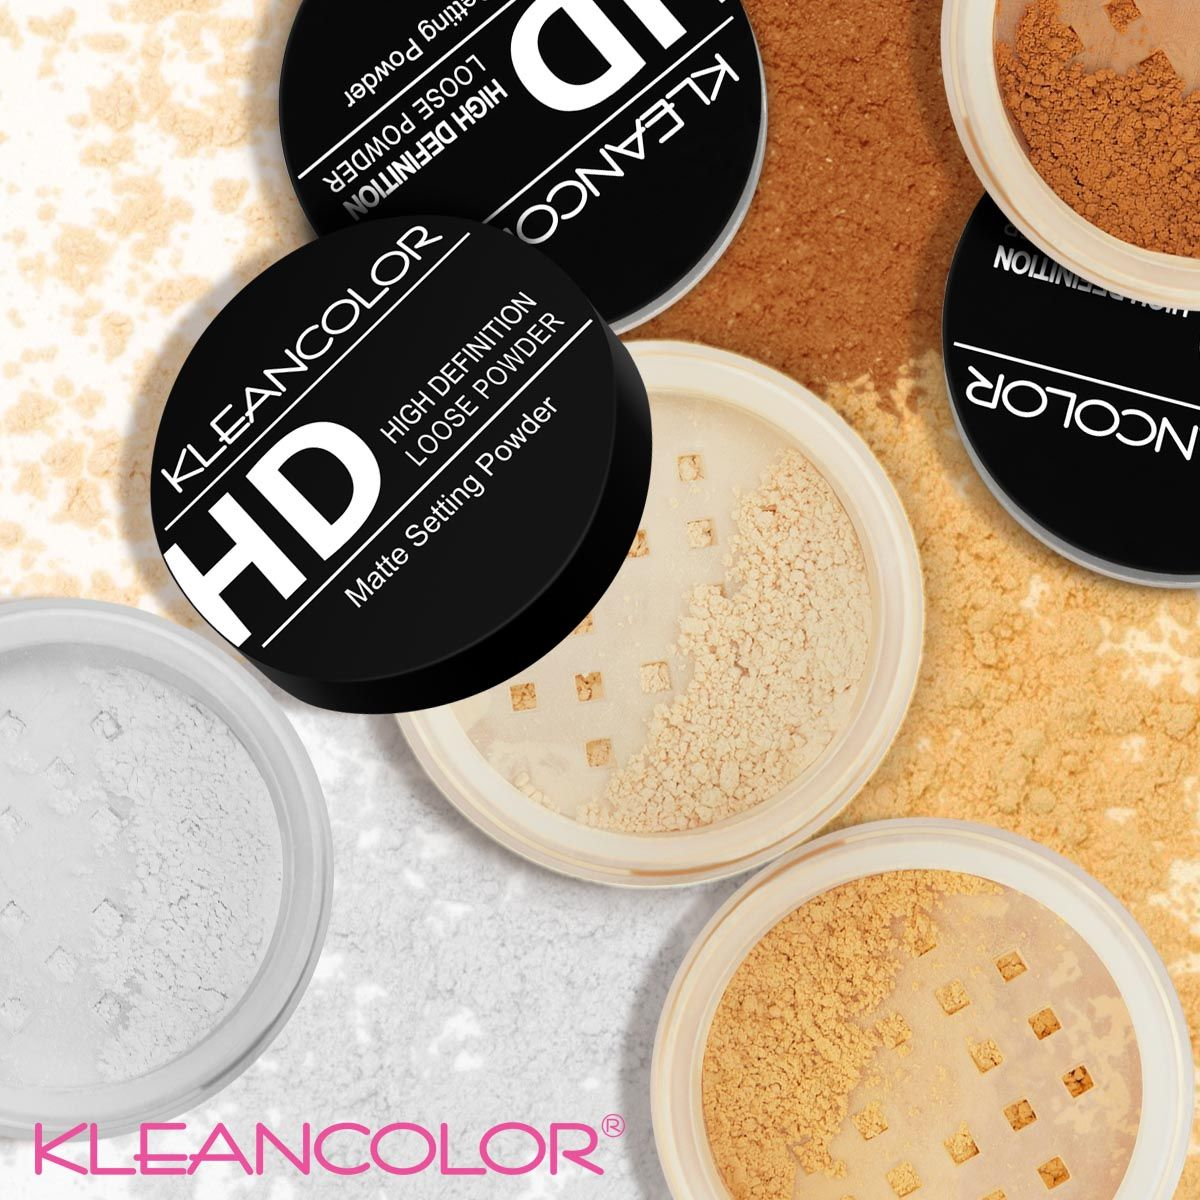 High Definition Matte Setting Loose Powder Kleancolor Loose Powder Translucent Powder Sheer Color